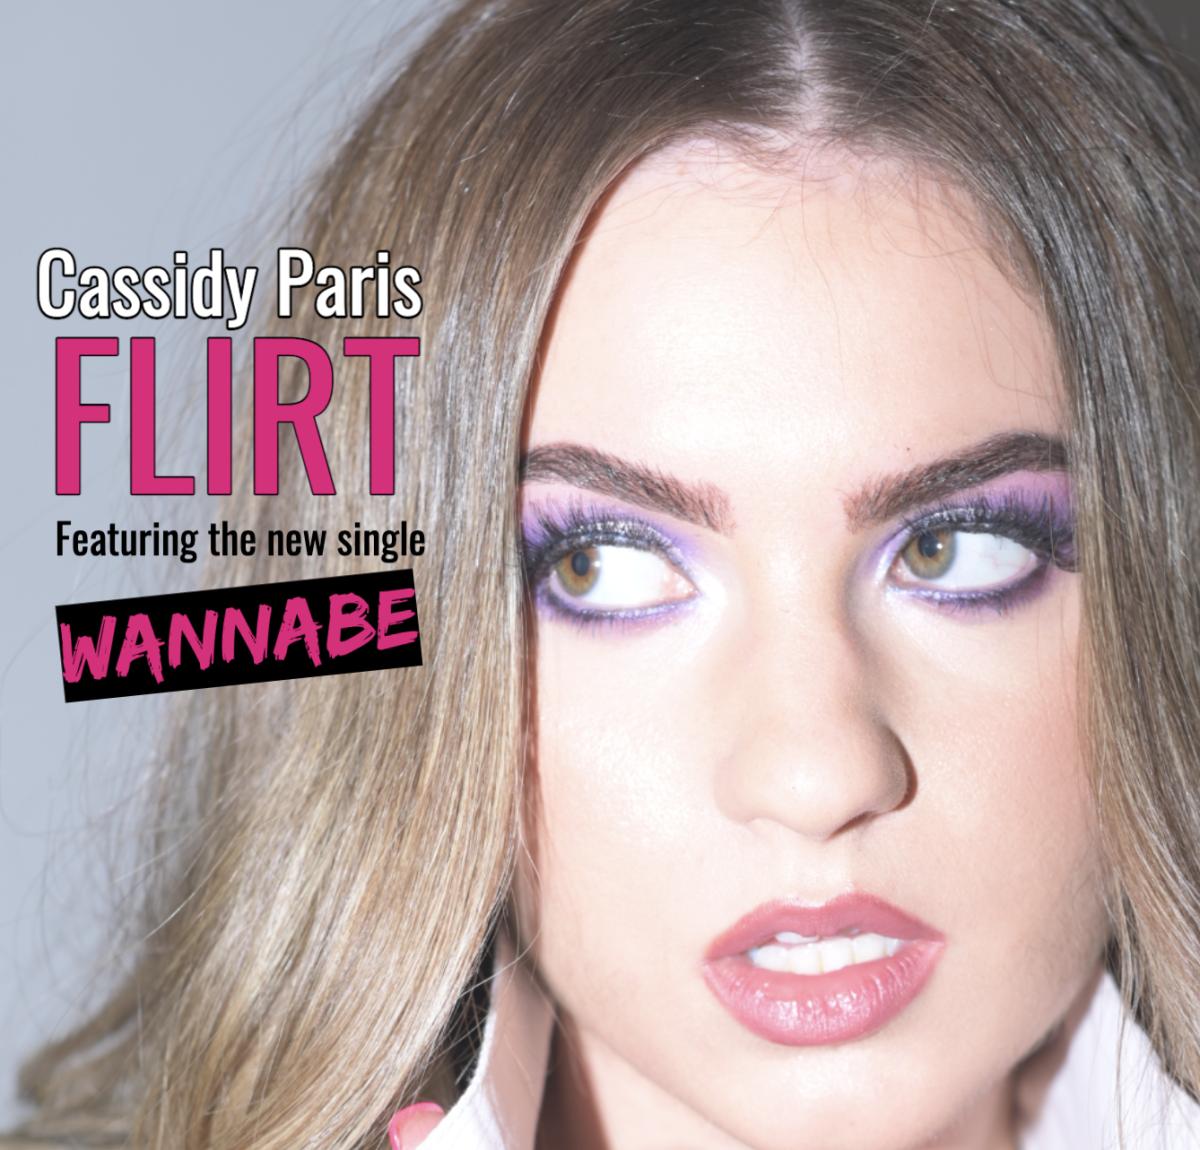 Cassidy Paris,